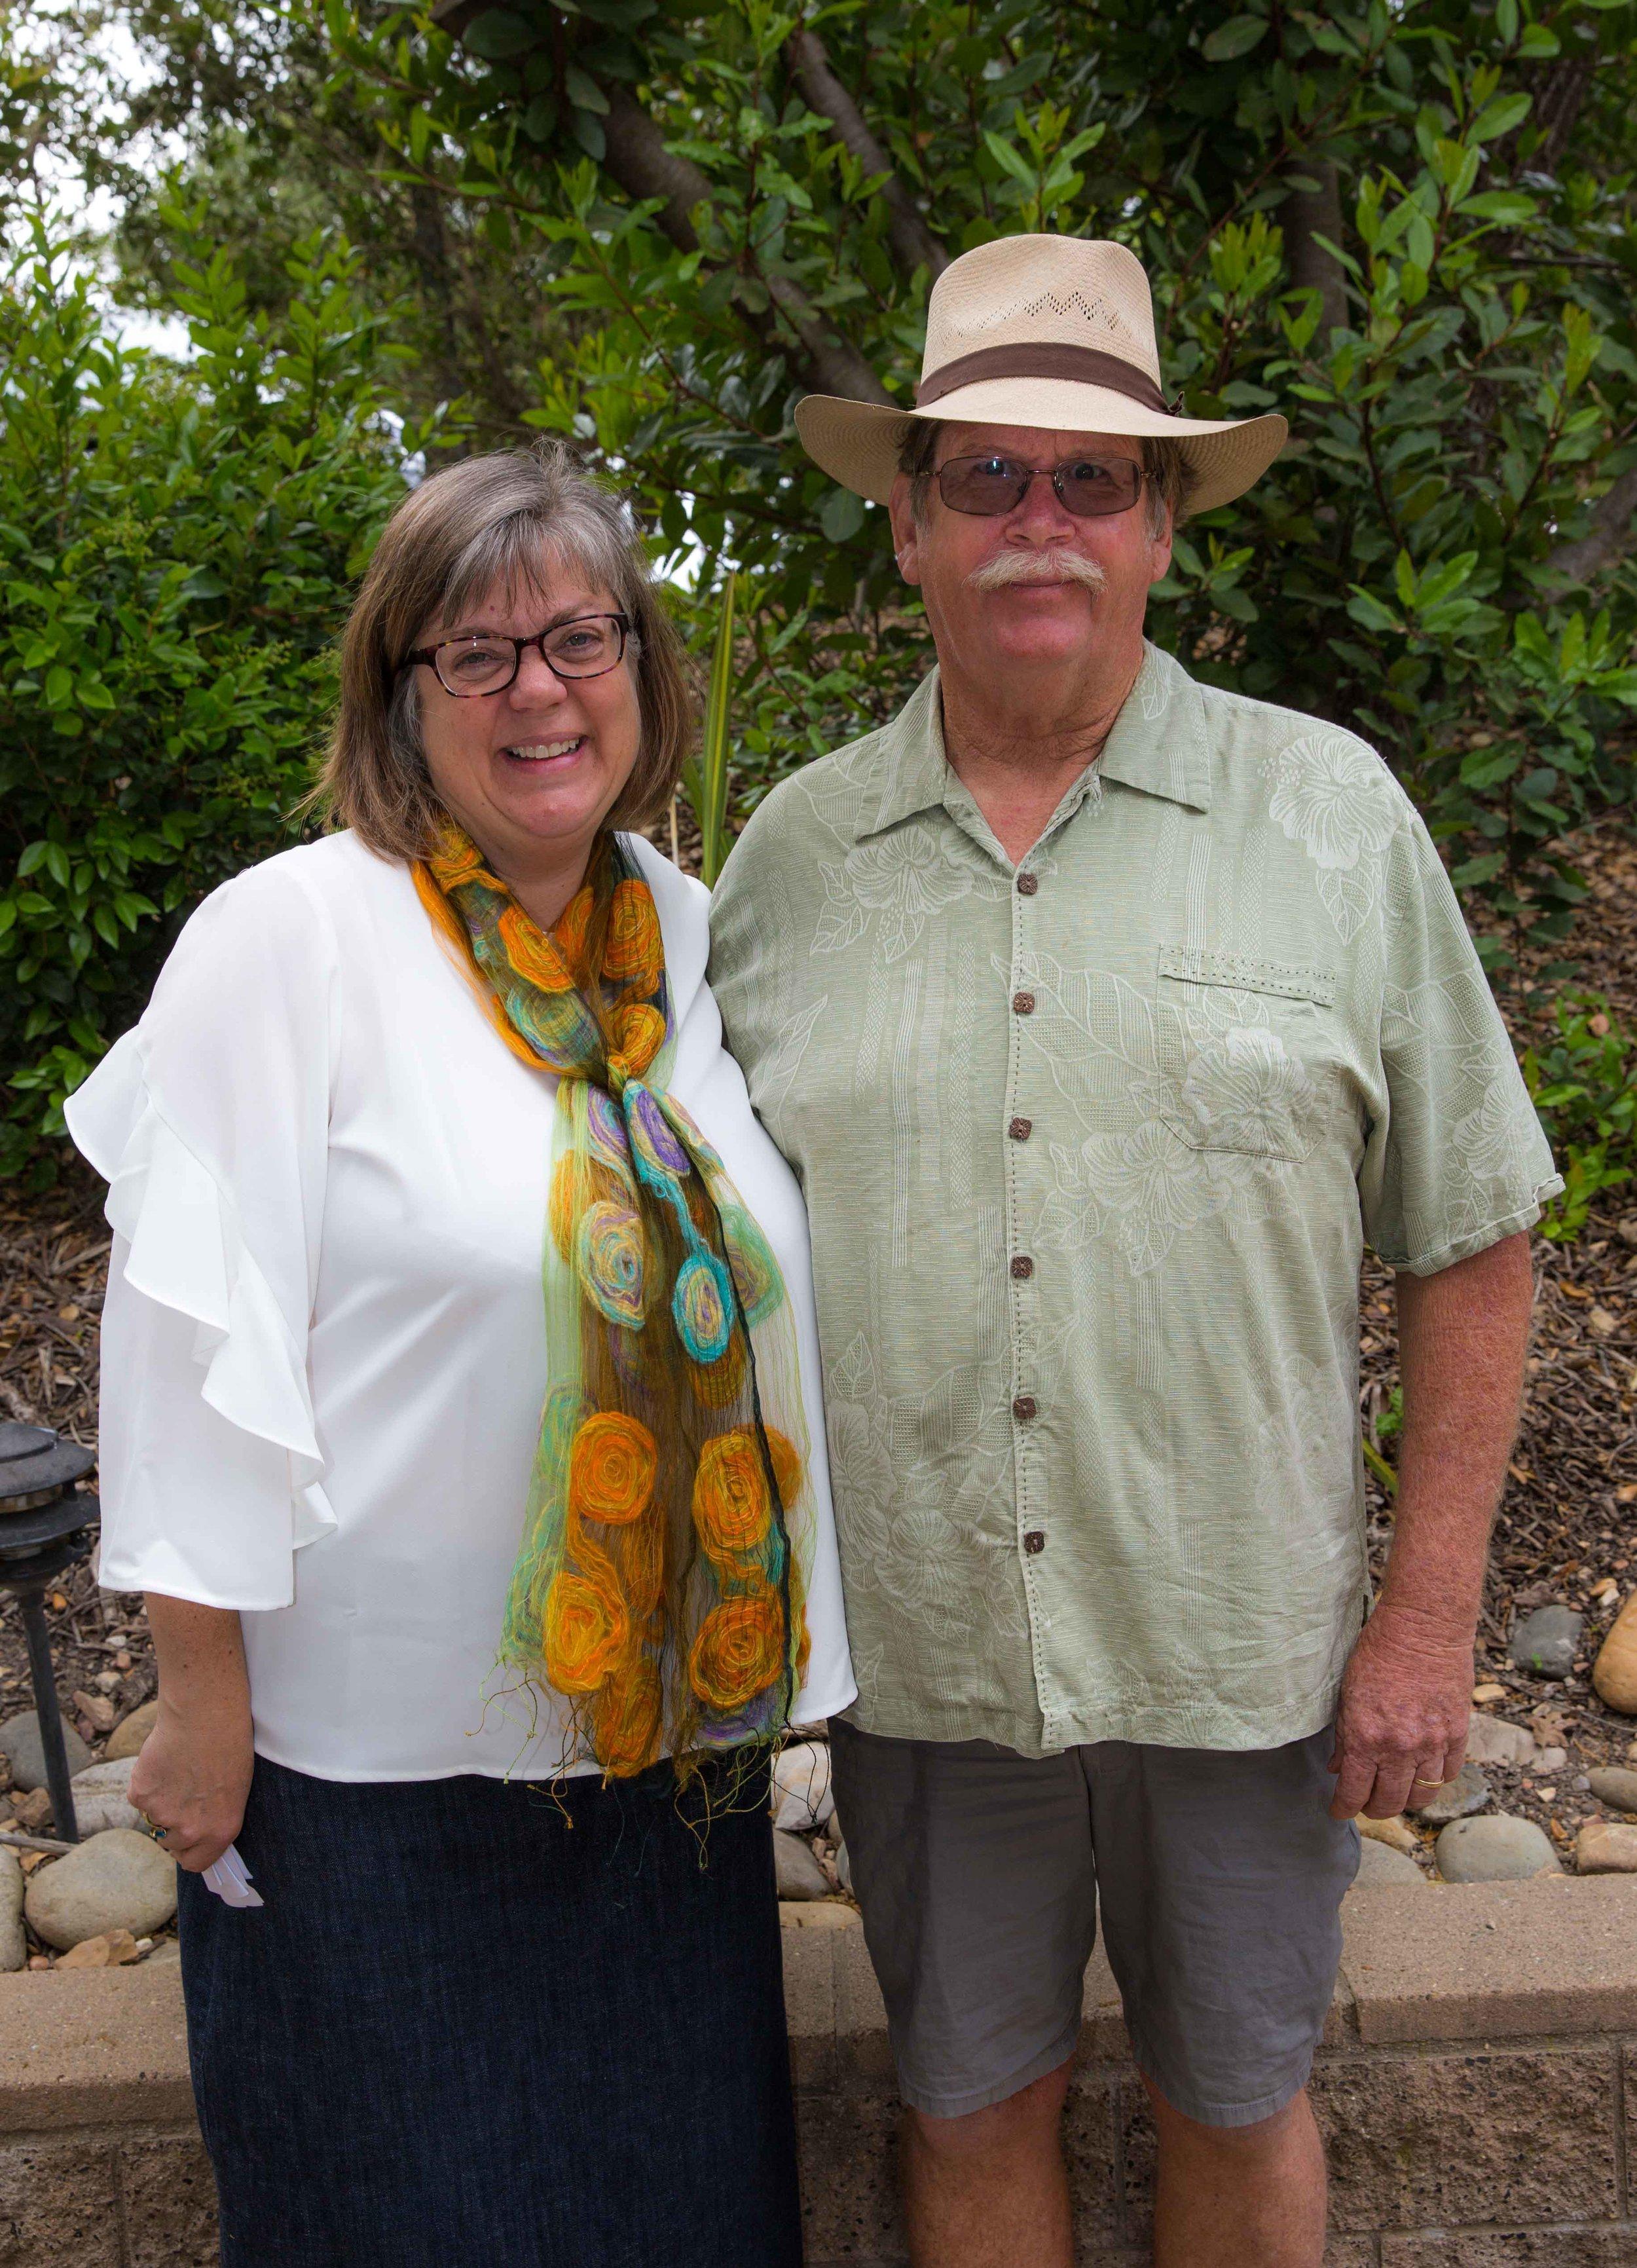 Stacey Otte-Demangate, Executive Director, and Peter Schuyler